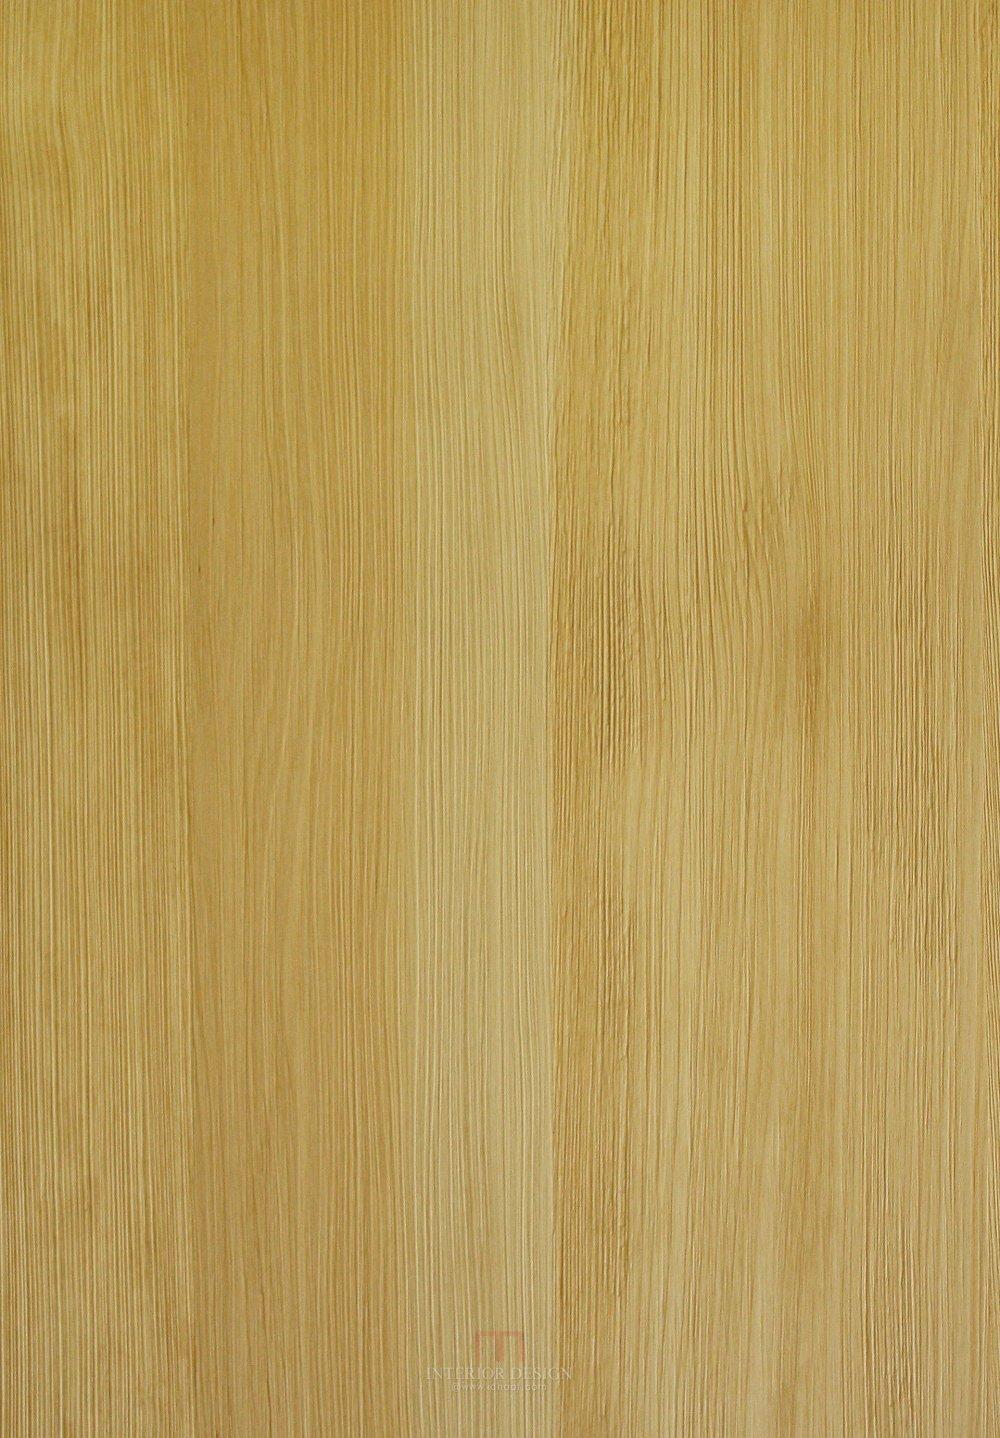 K6196PN_檜木噴砂自然拼.jpg